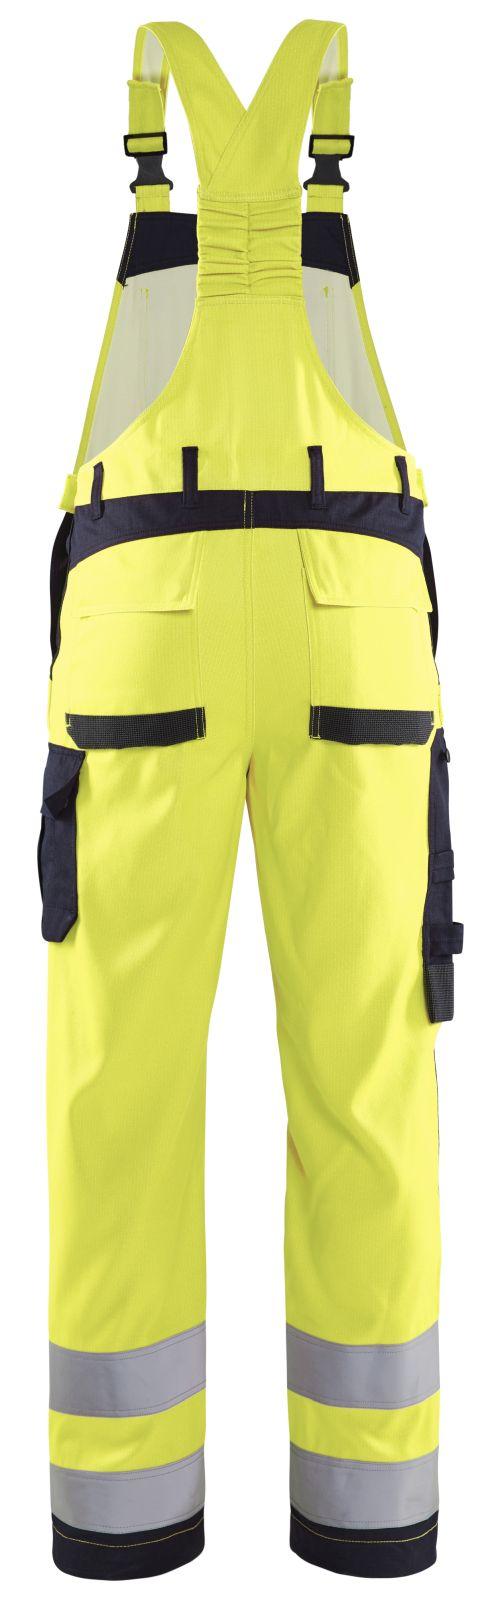 Blaklader Amerikaanse overalls 28891512 Multinorm geel-marineblauw(3389)